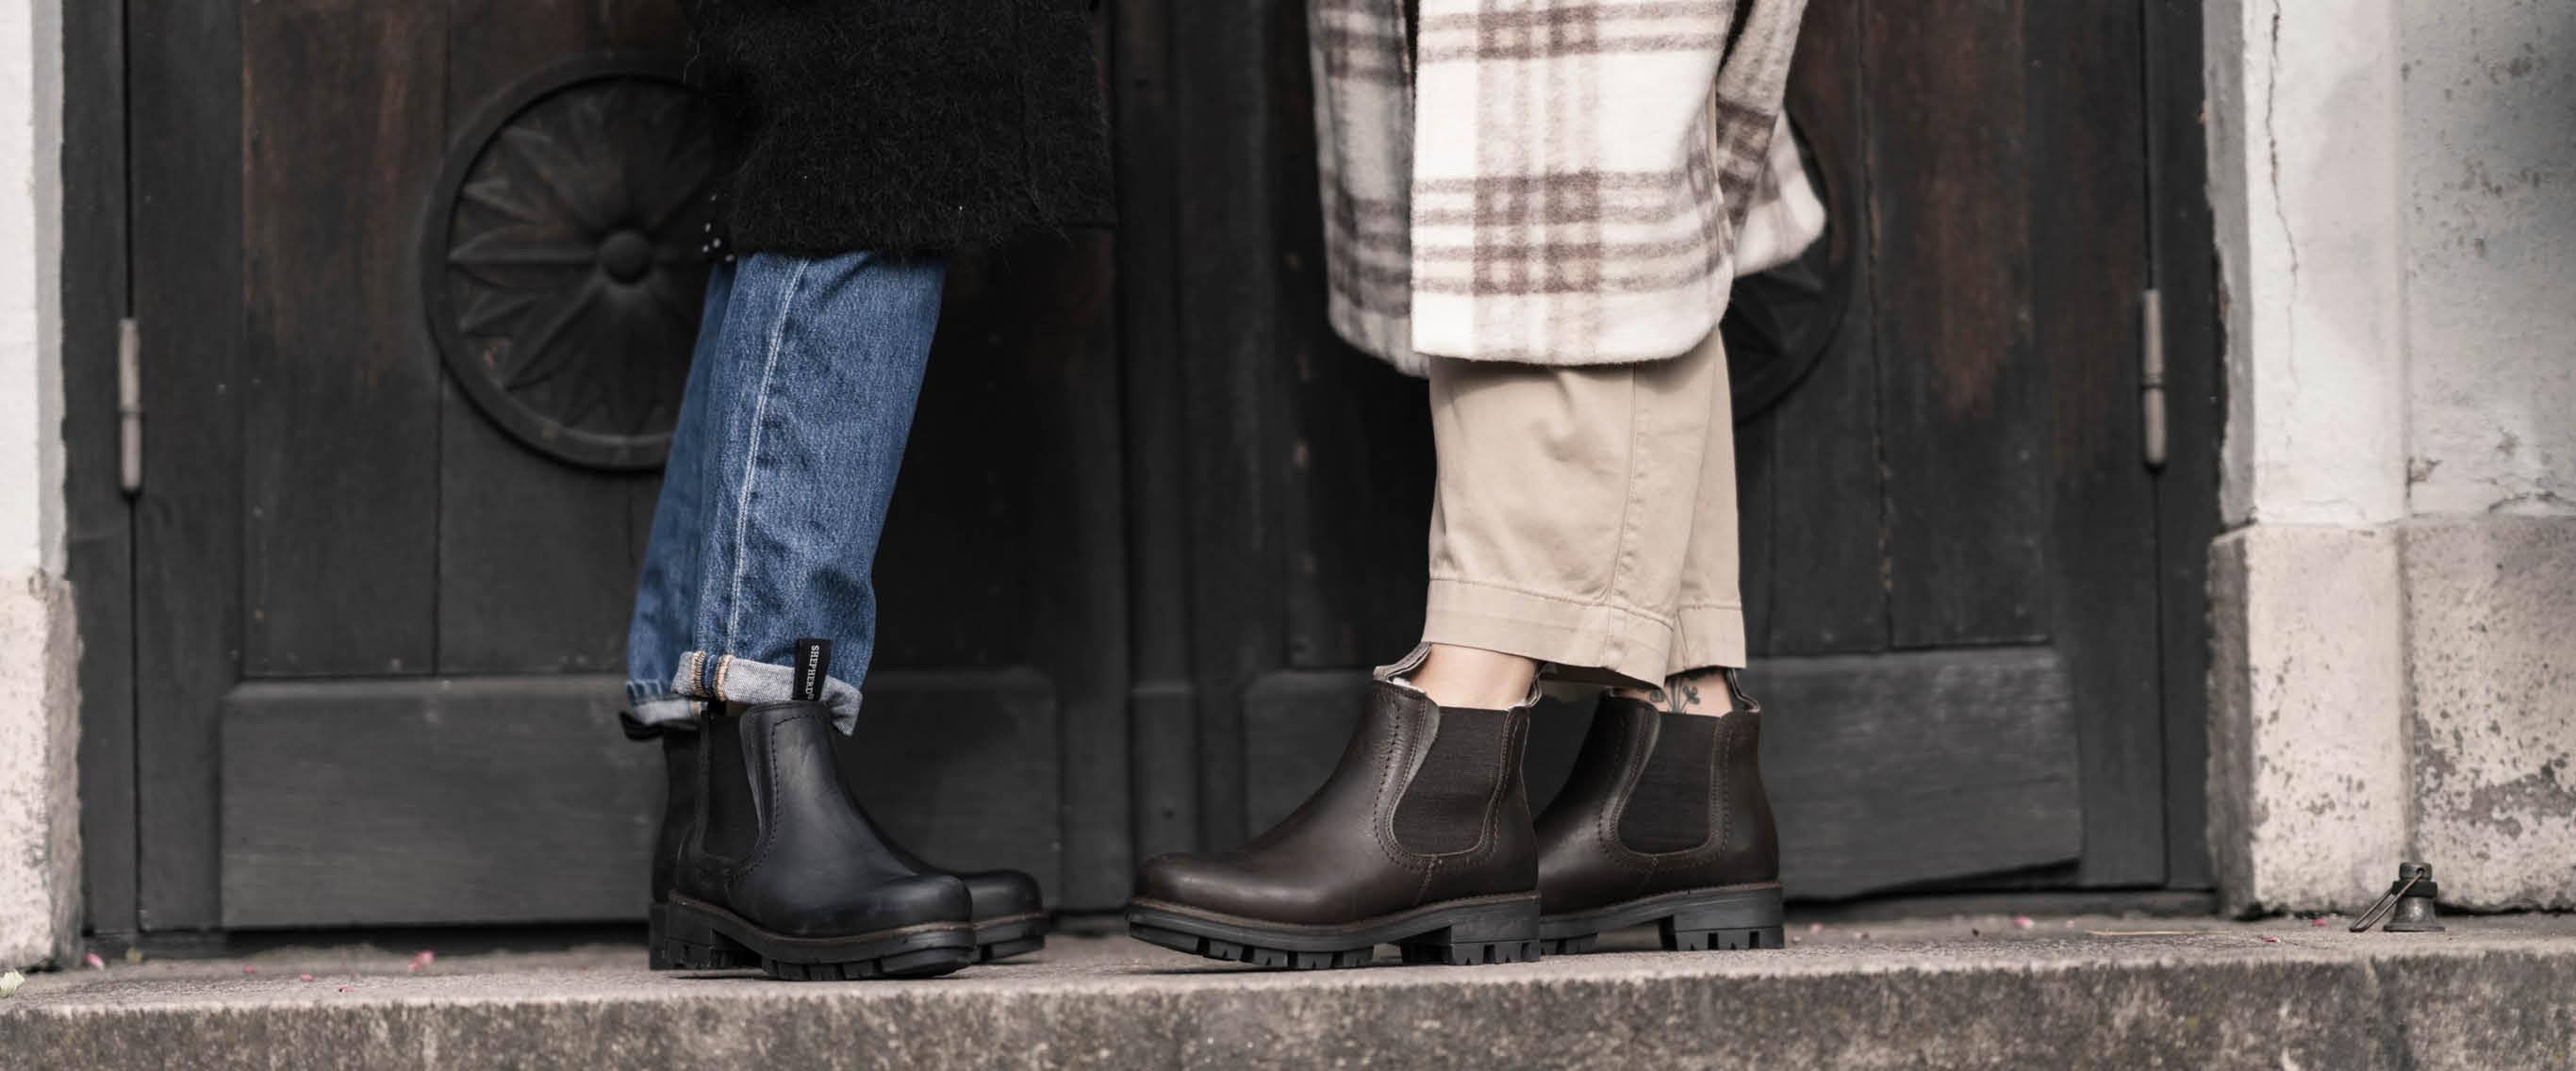 Warm shoes with genuine sheepskin lining